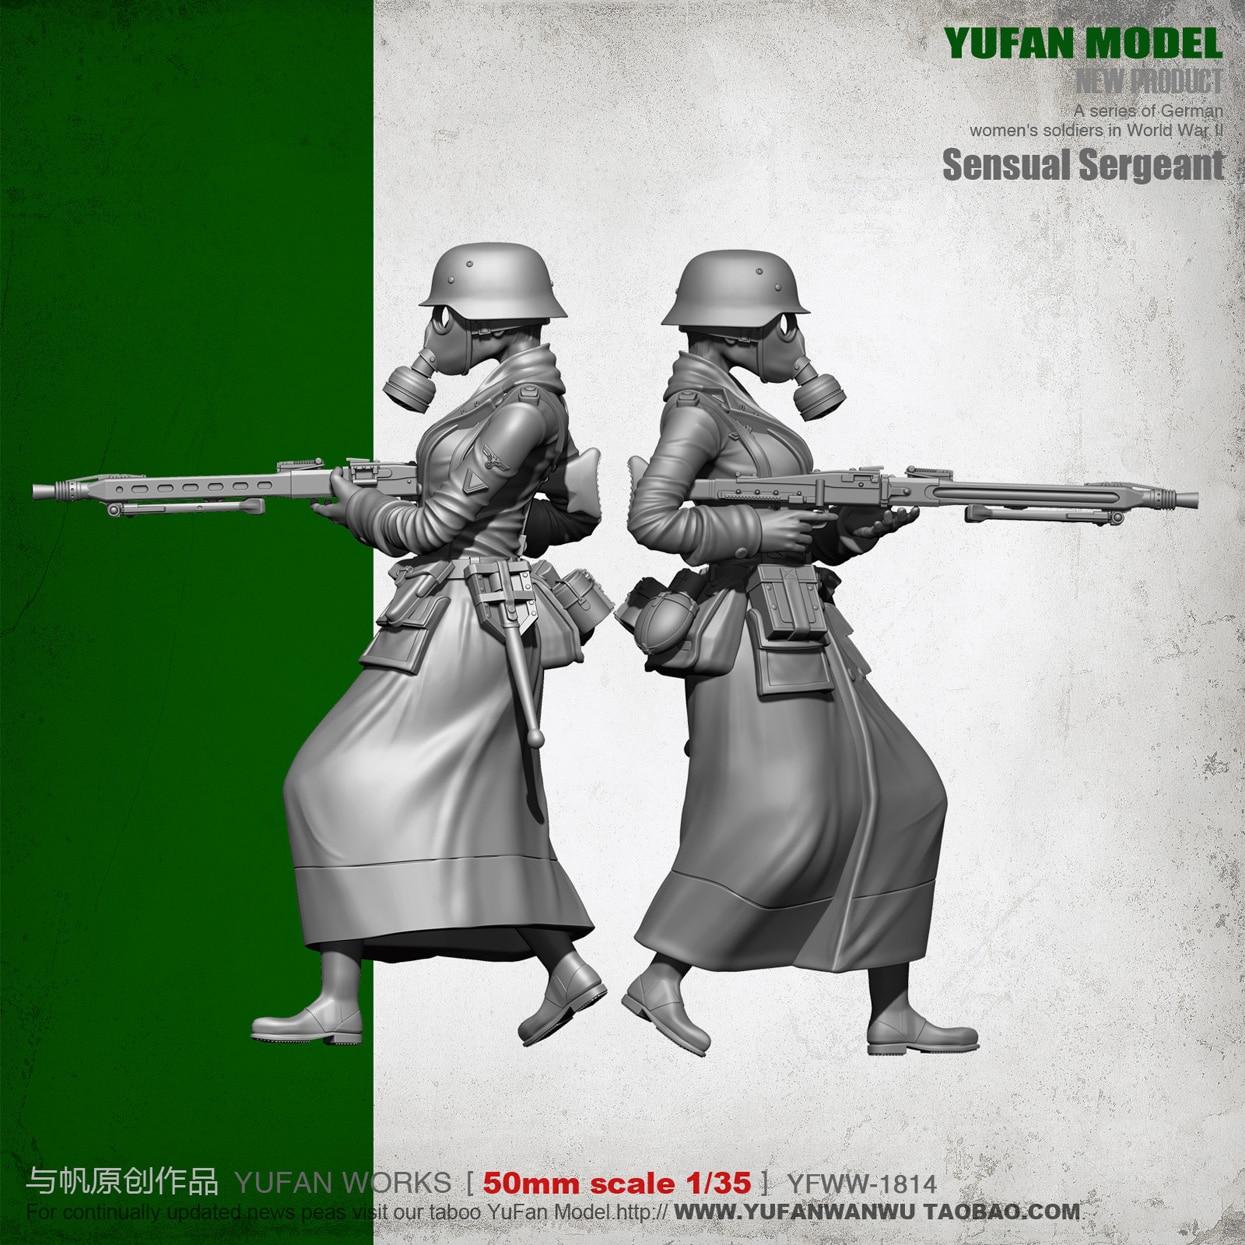 YUFAN modelo Original 1/35 máquina de belleza Gunner resina soldado YFWW35-1814 KNL Hobby